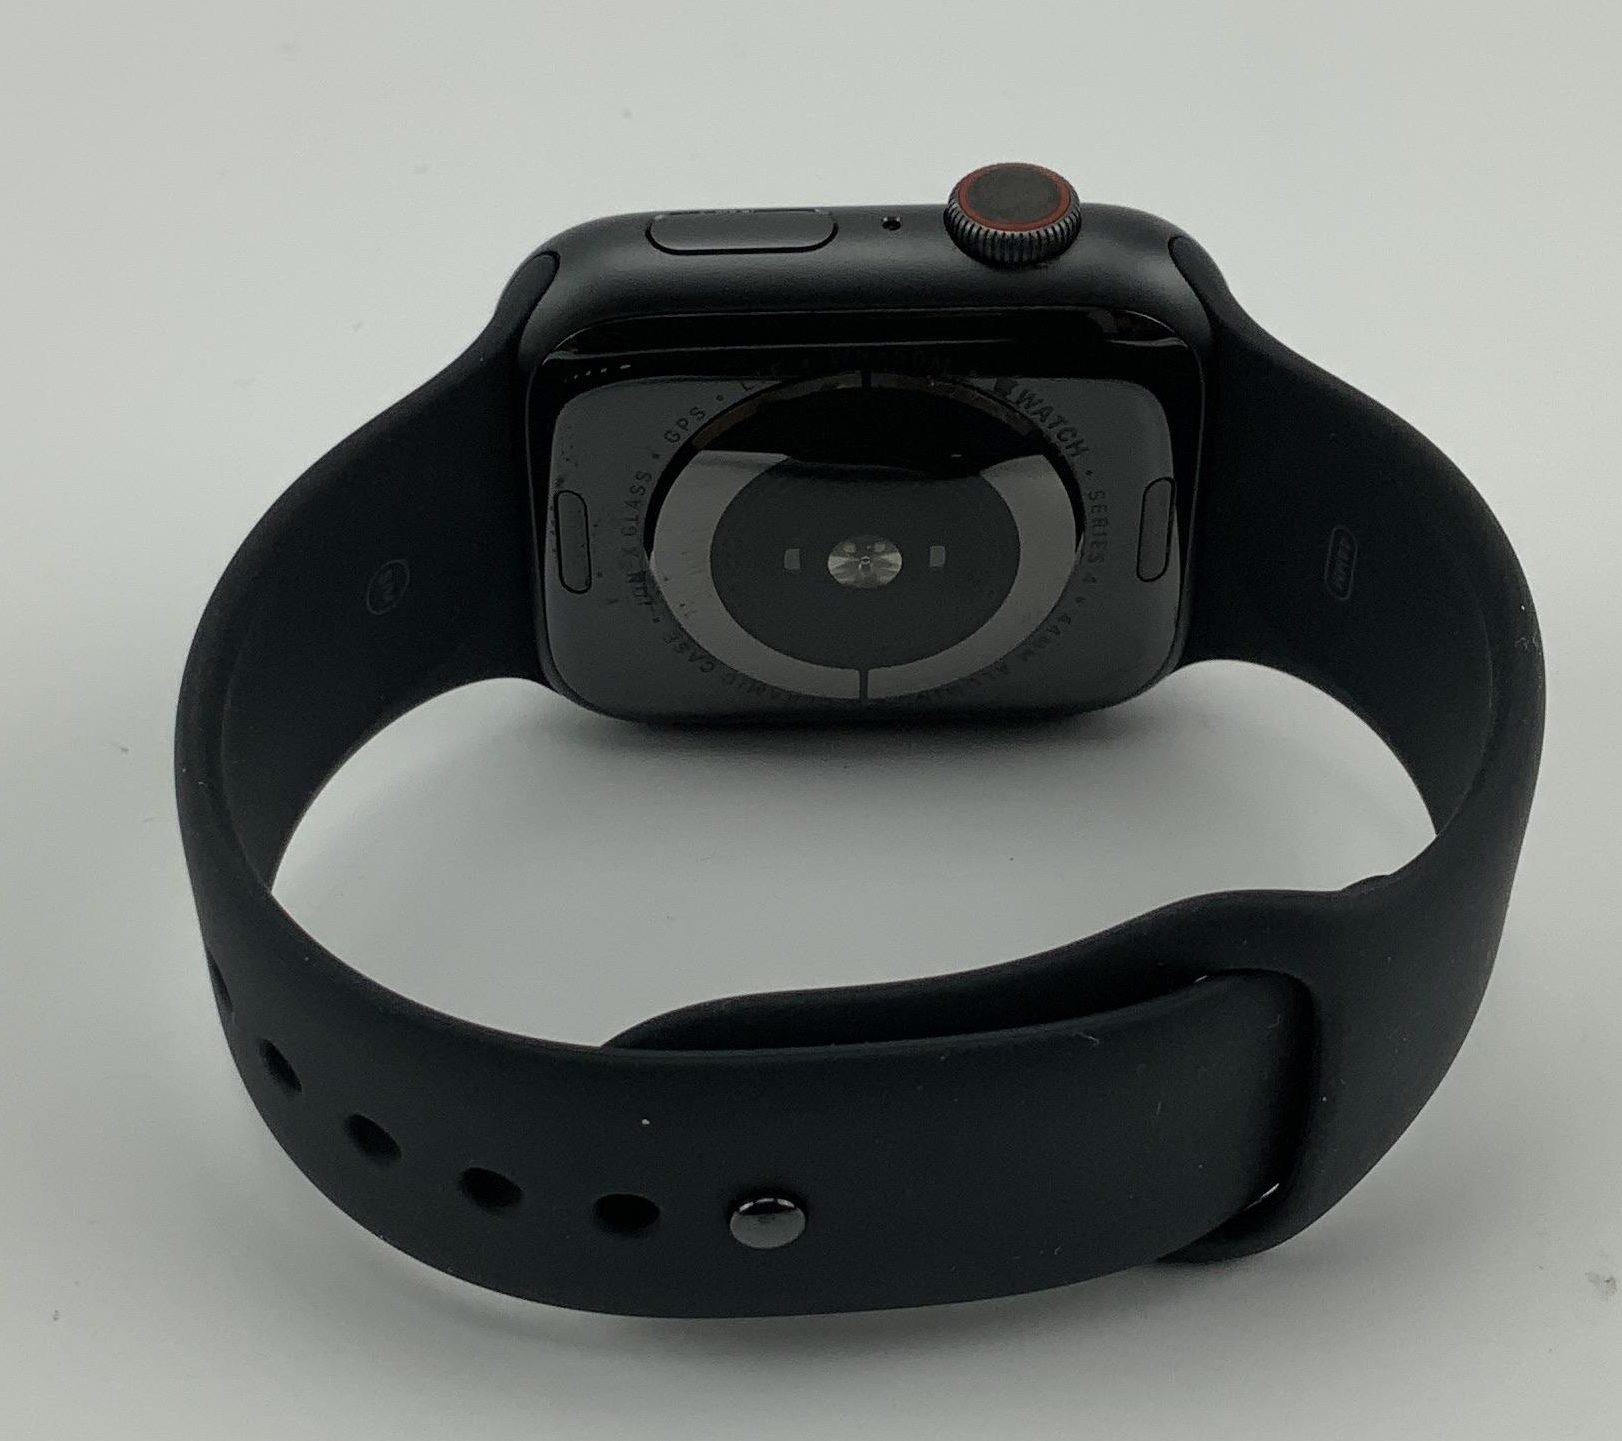 Watch Series 4 Aluminum Cellular (44mm), Space Gray, Black Sport Band, imagen 3